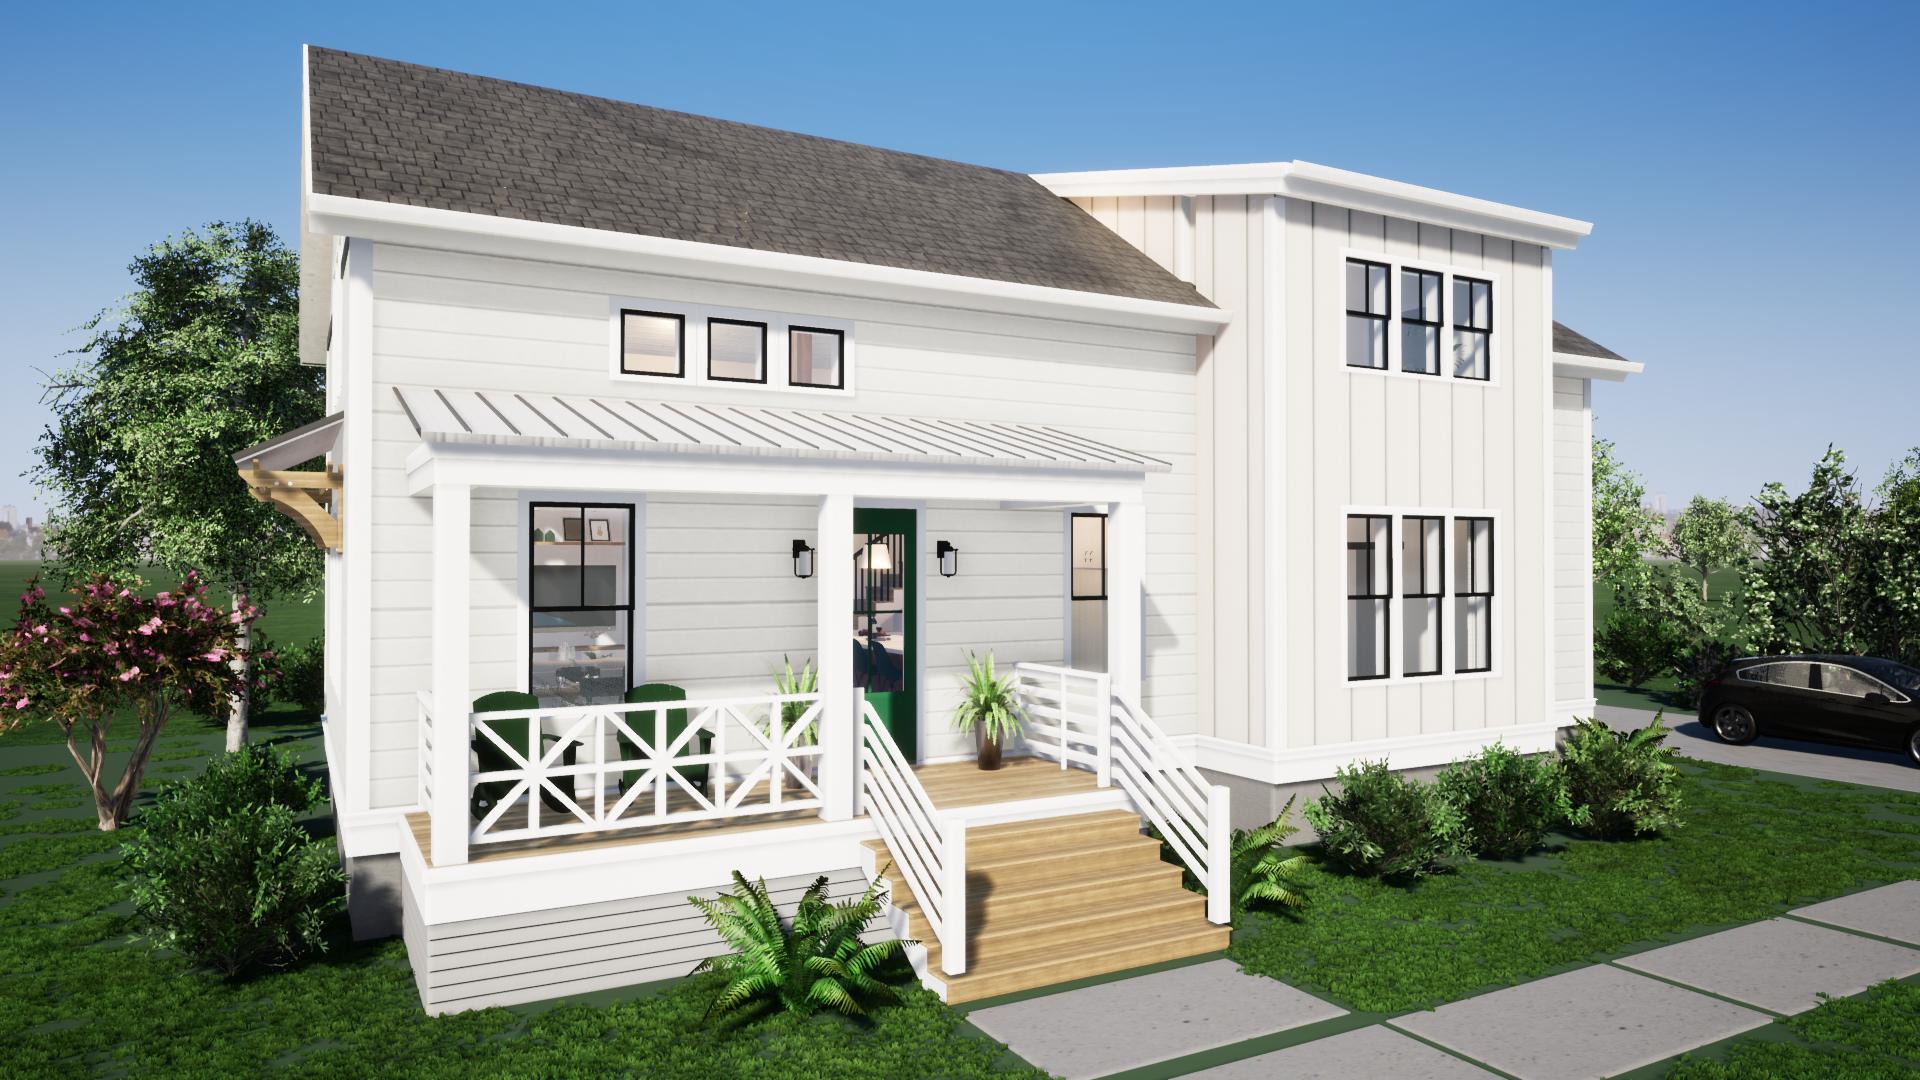 Ashley Forest Homes For Sale - 2 Live Oak, Charleston, SC - 7